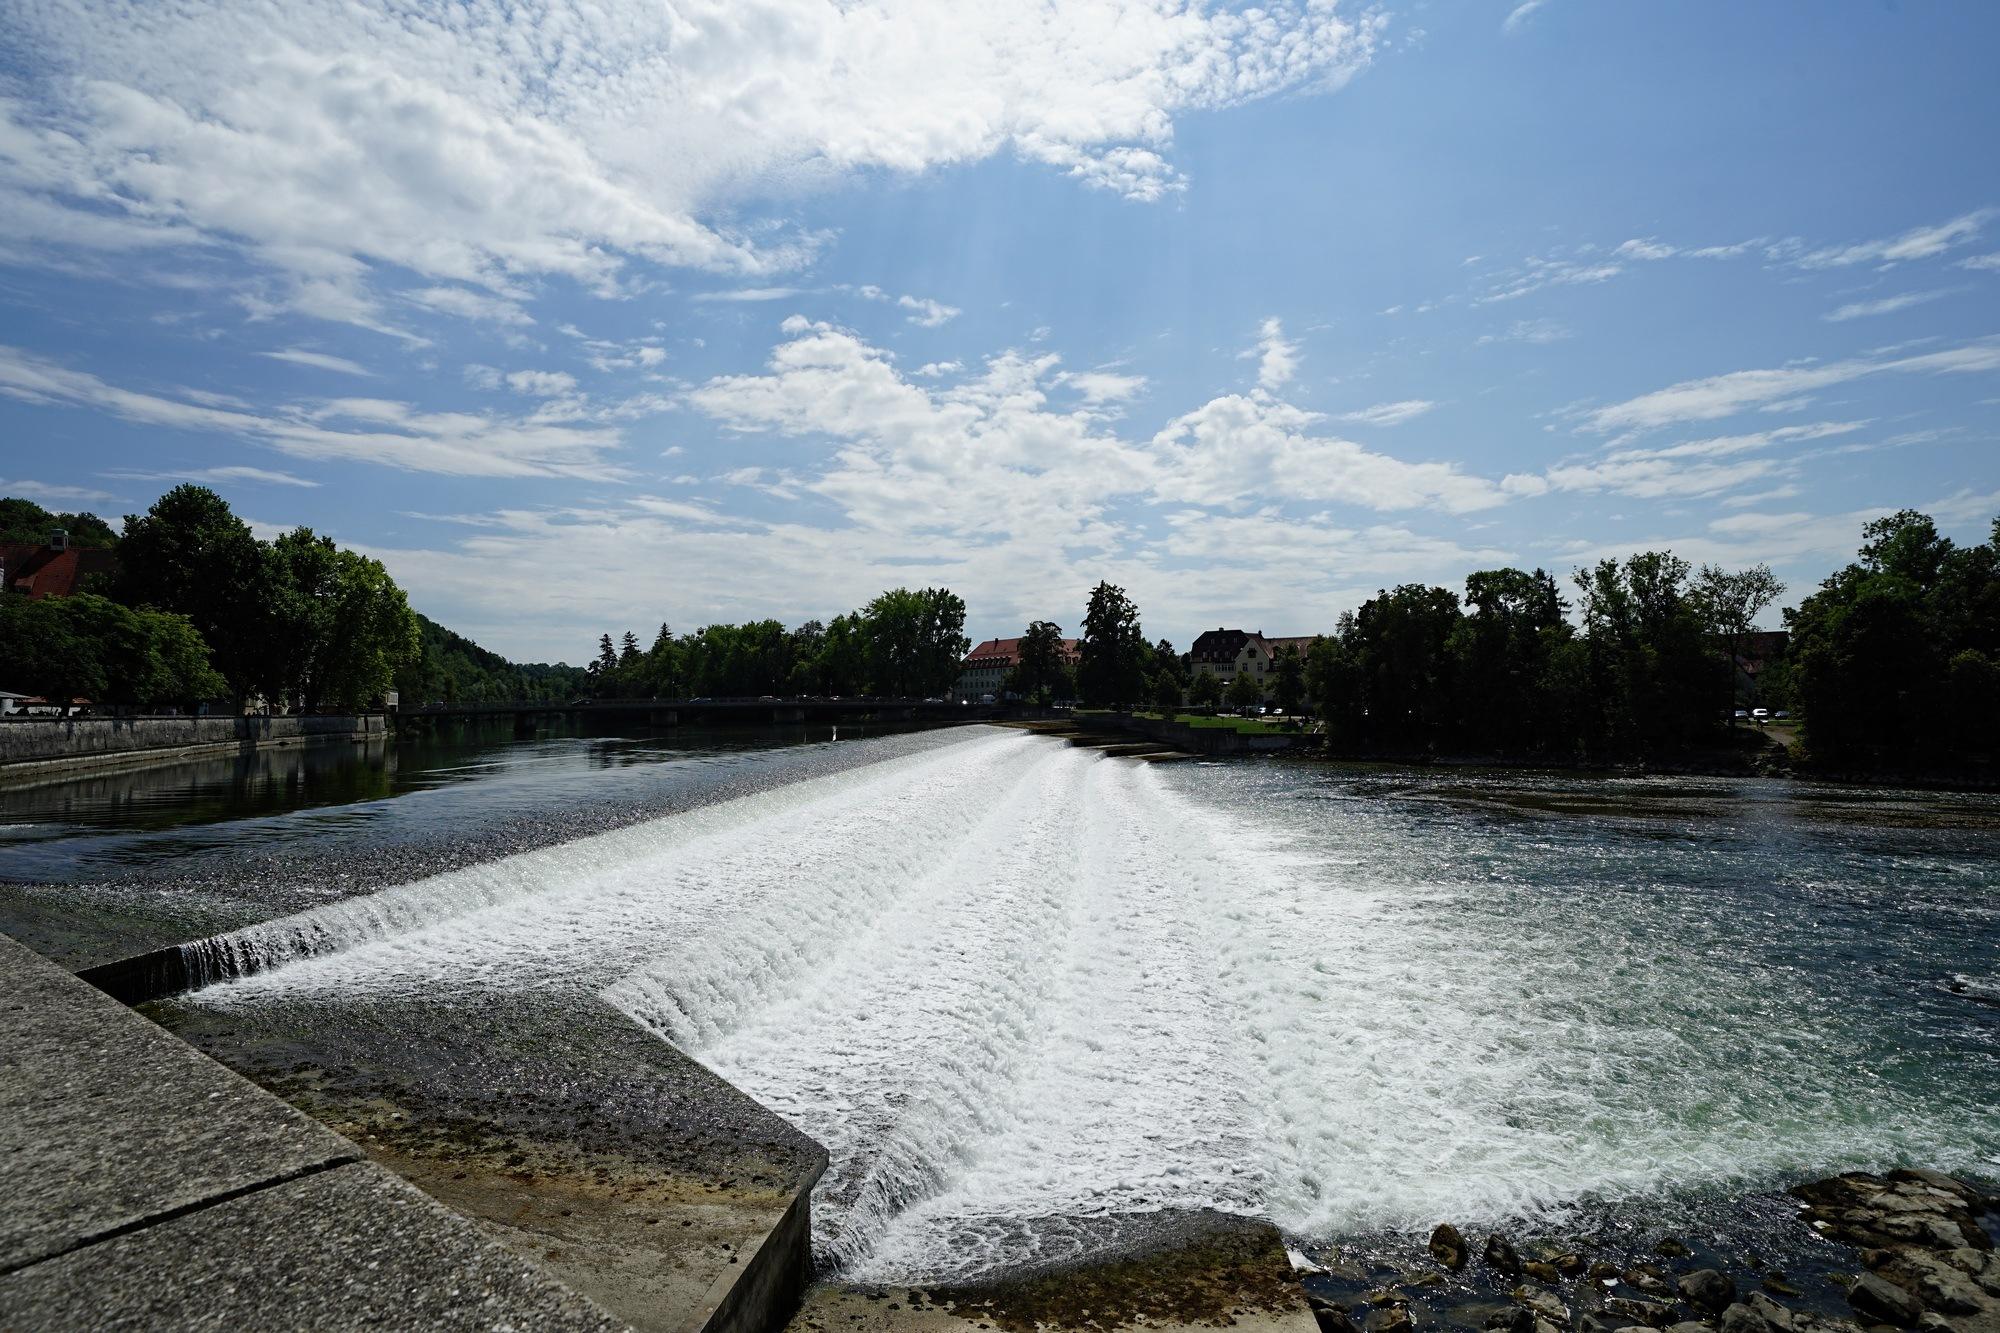 River Lech near Landsberg, Bavaria by WolfgangH